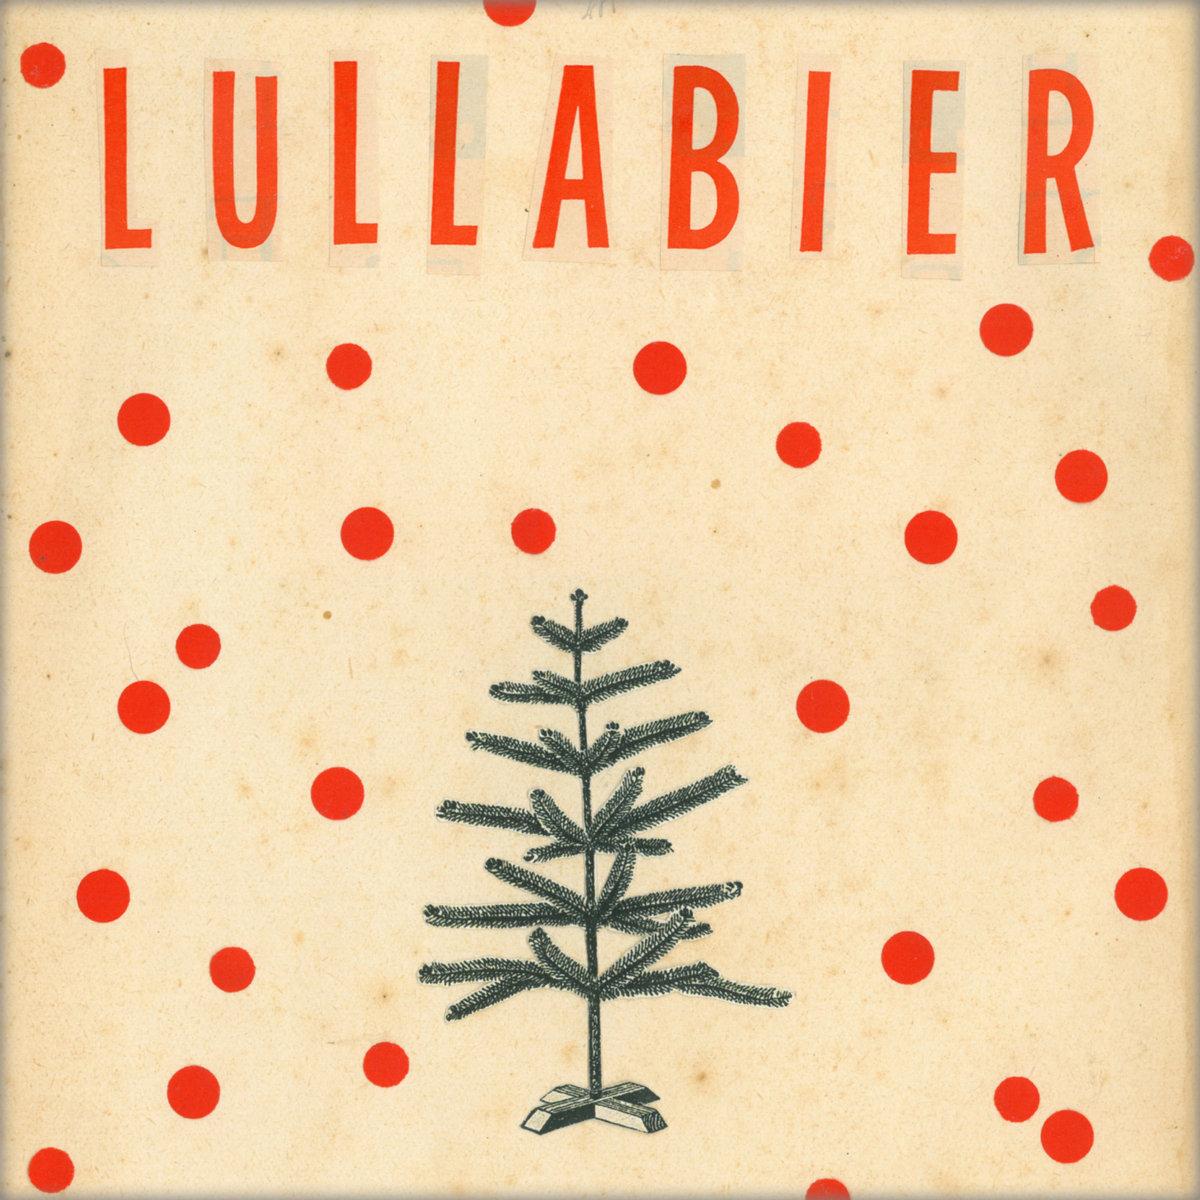 Lullabier - 2512